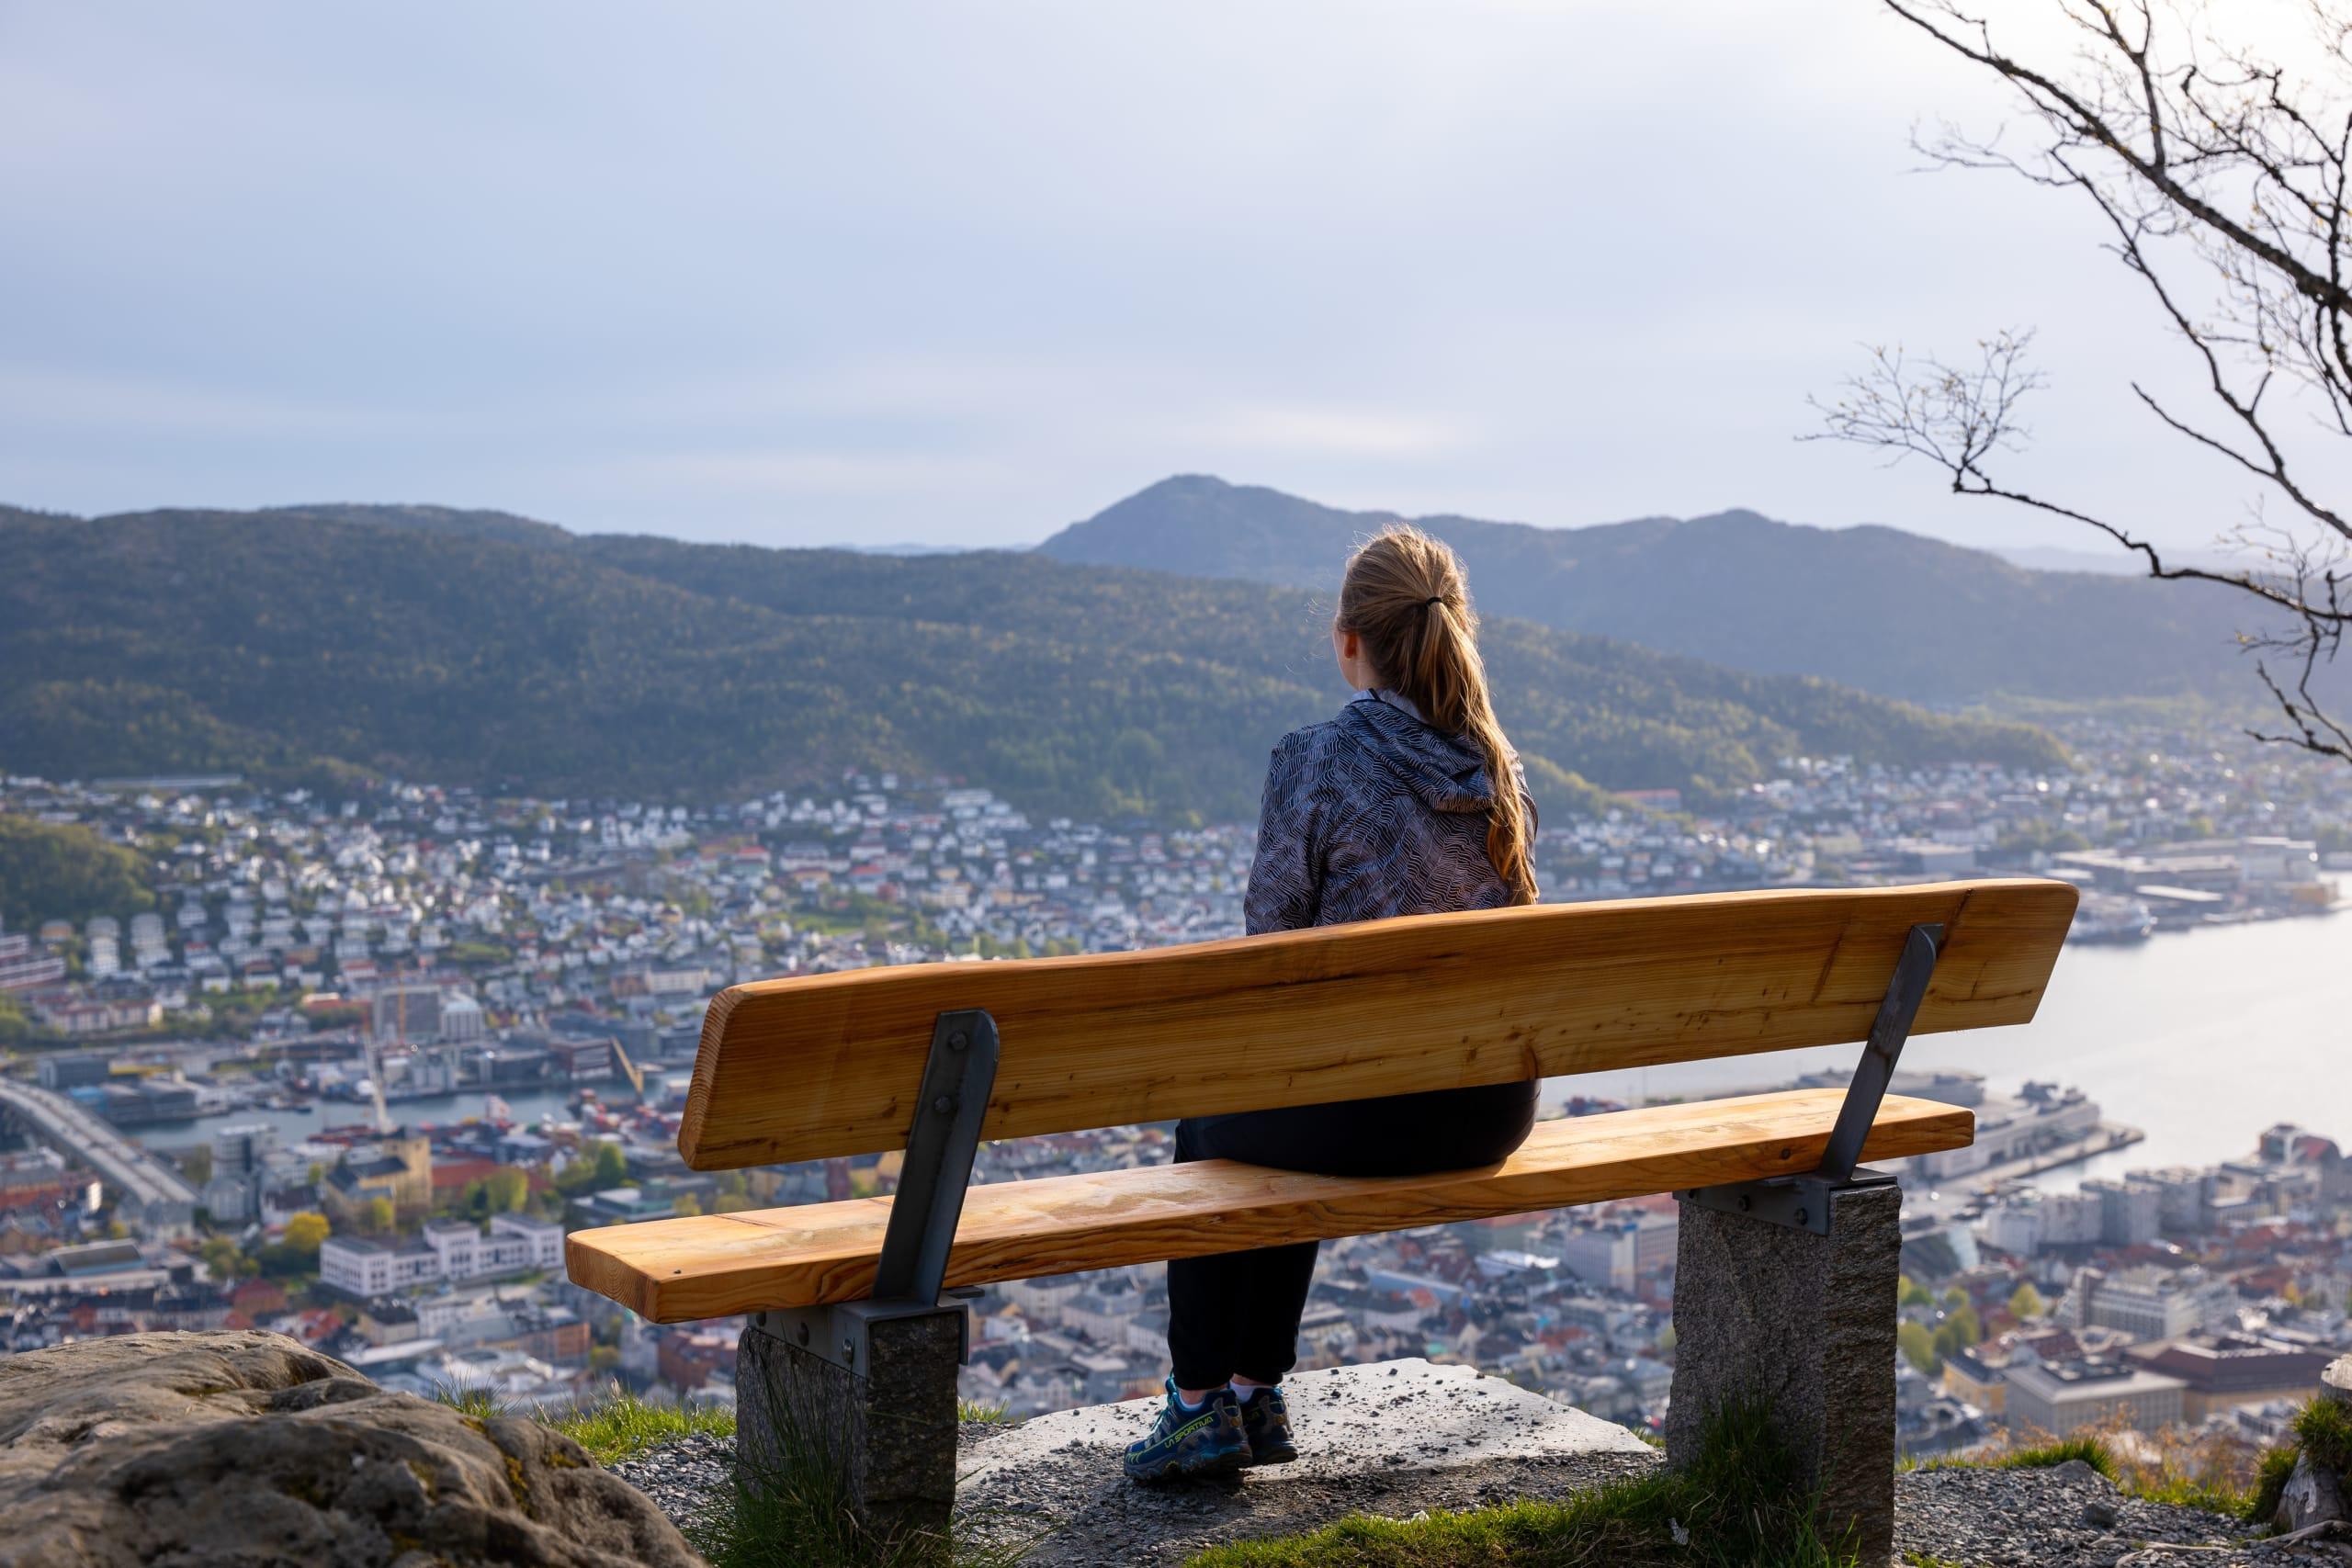 Bench at Mount Fløyen overlooking Bergen city